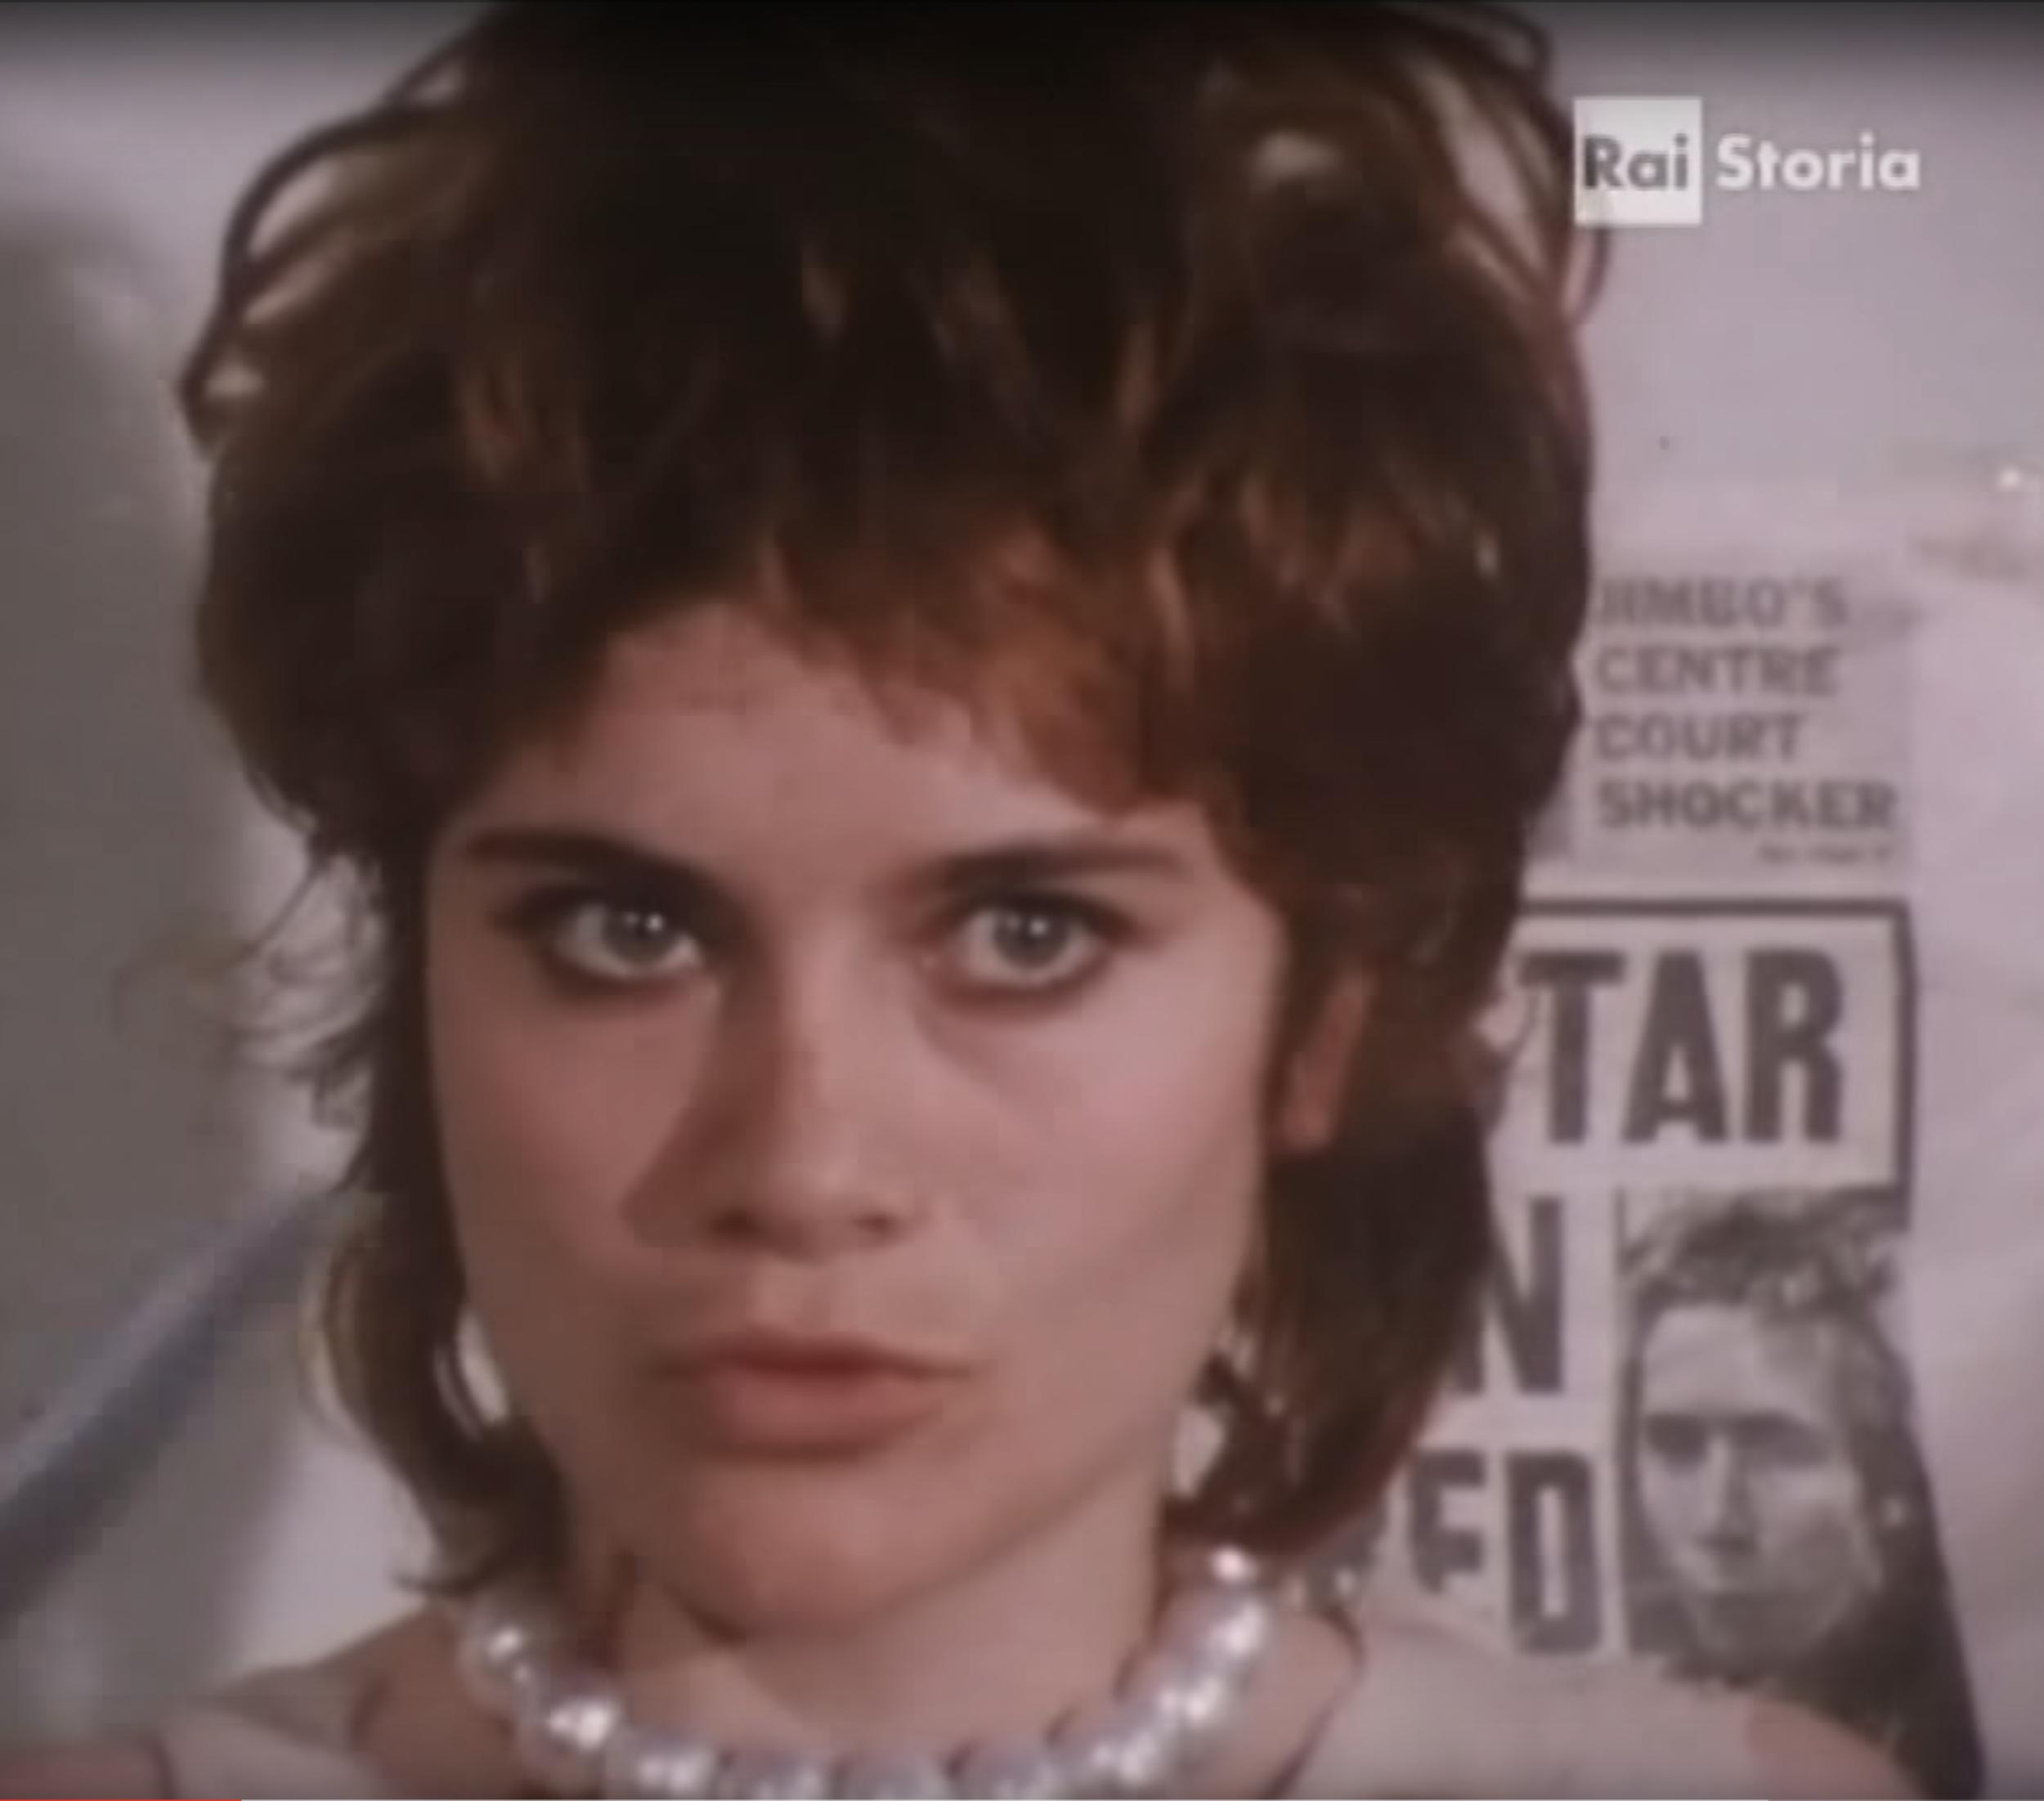 Odeon - Punk Rock a londra 1977 Italian interview